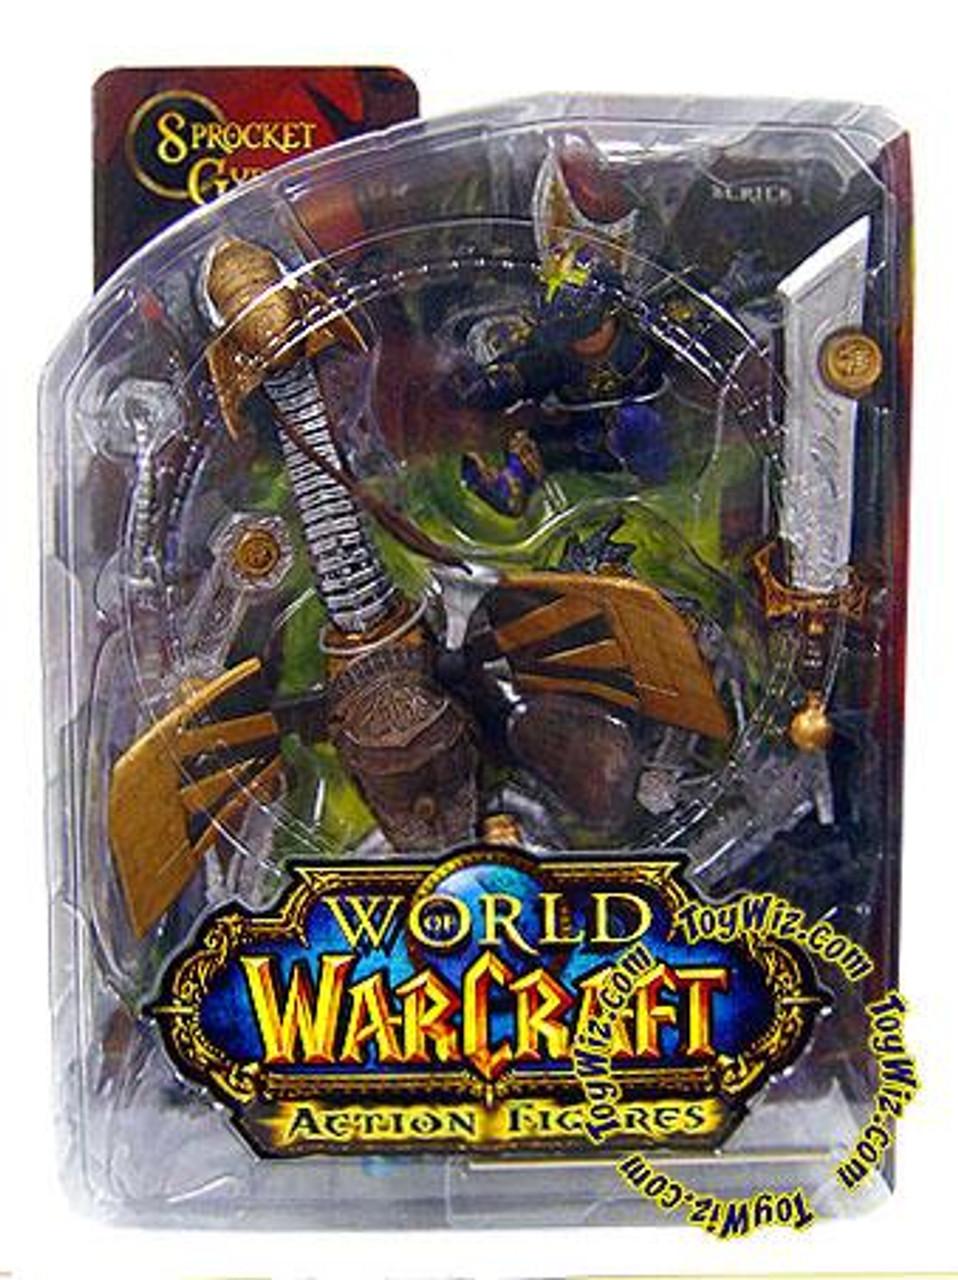 World of Warcraft Series 2 Sprocket Gyrospring Action Figure [Gnome Warrior]